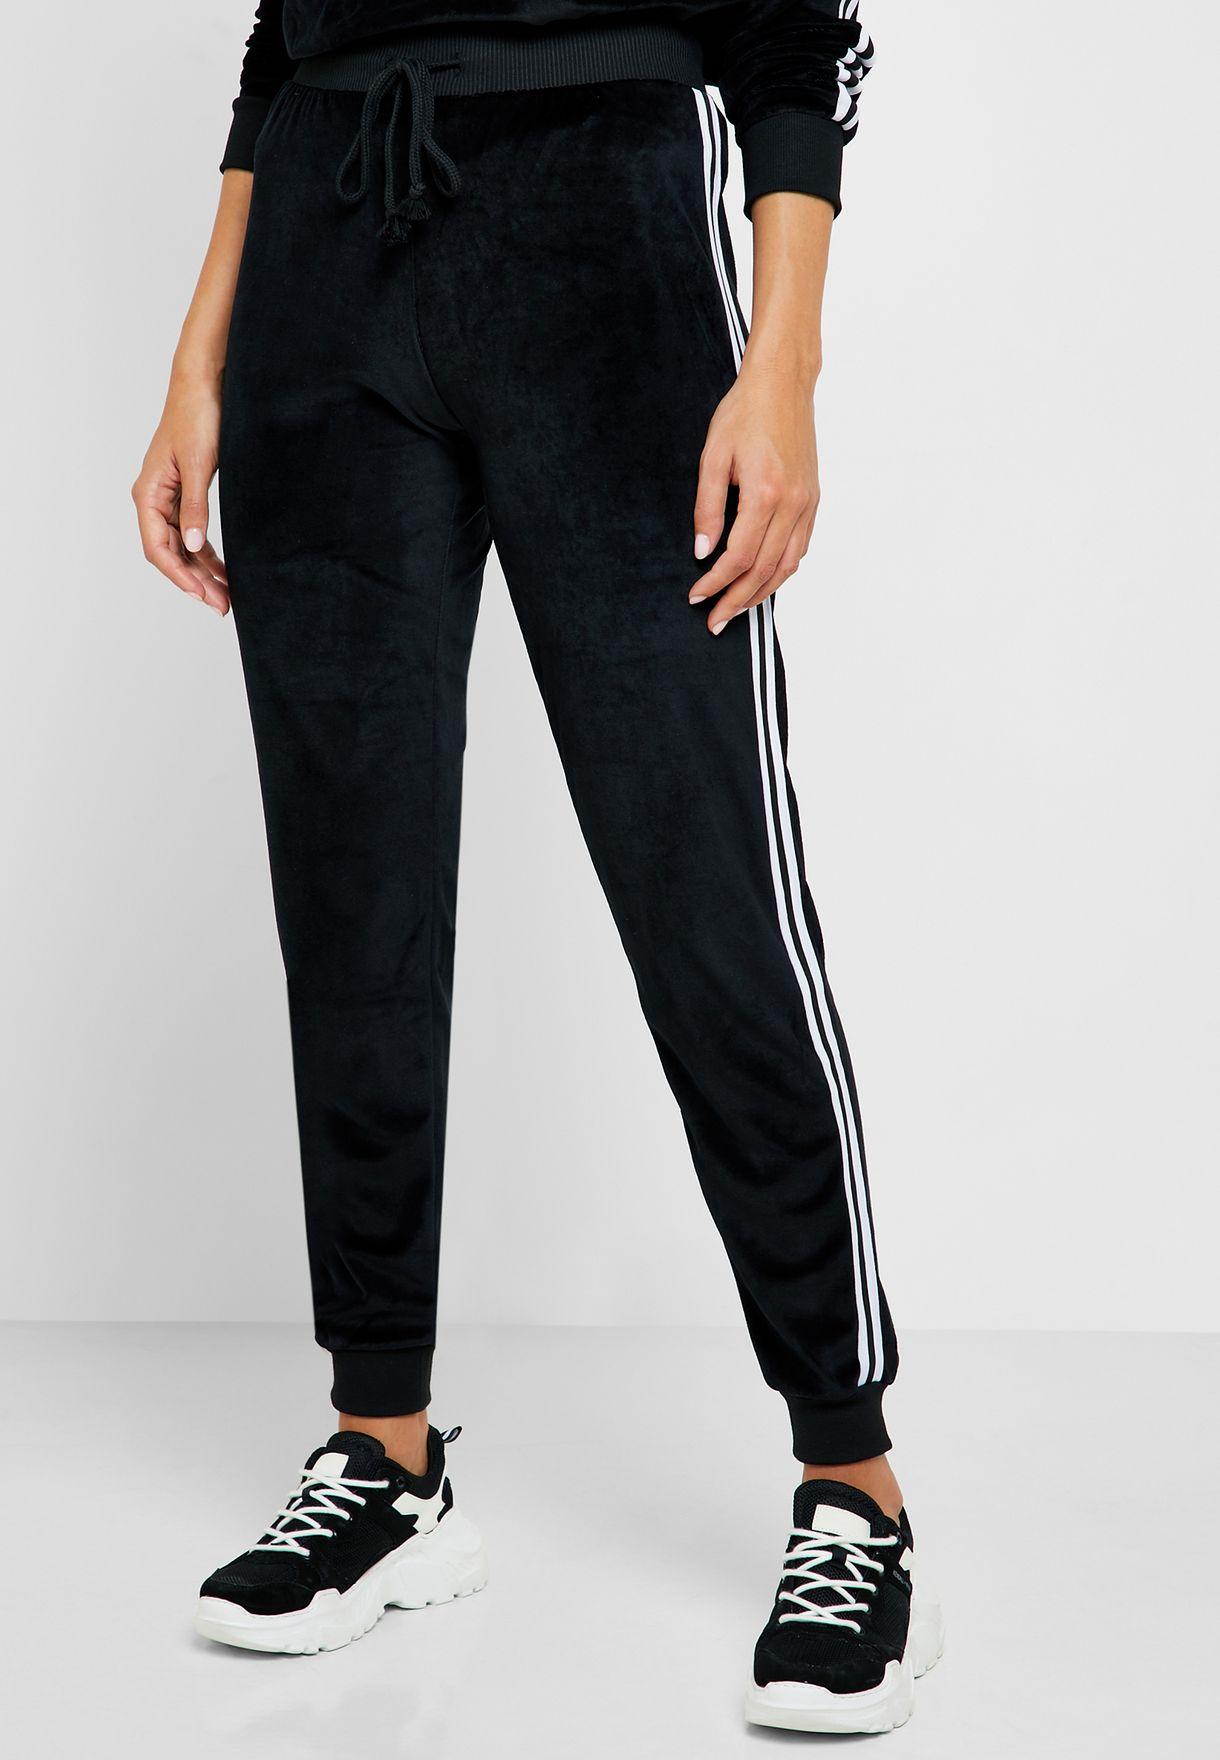 Contrast Side Paneled Jogger Pants Set